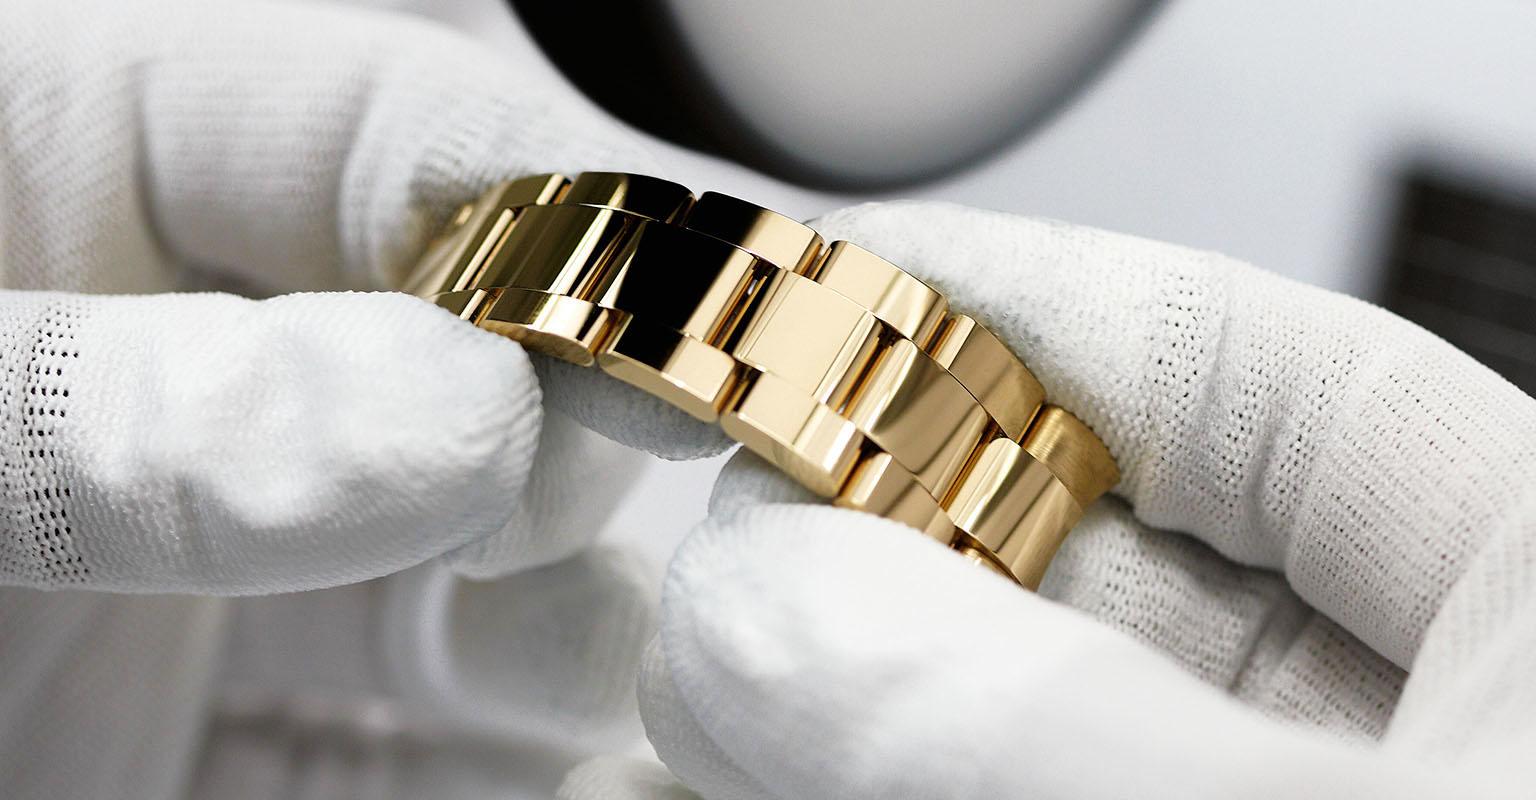 Rolex Deepsea Gold Satin Surface Finishing